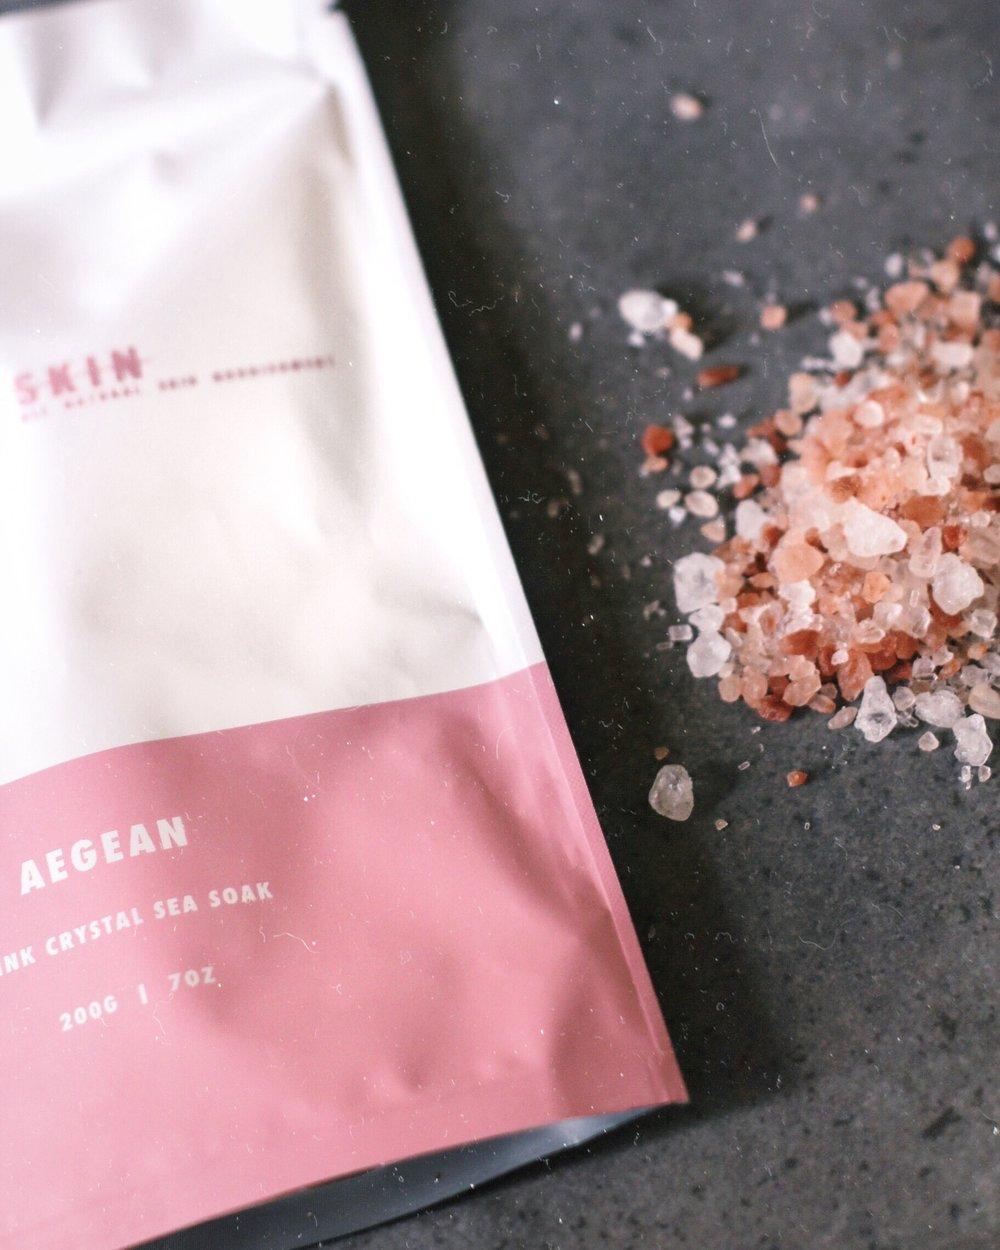 Santorini Skin Aegean Pink Crystal Sea Soak